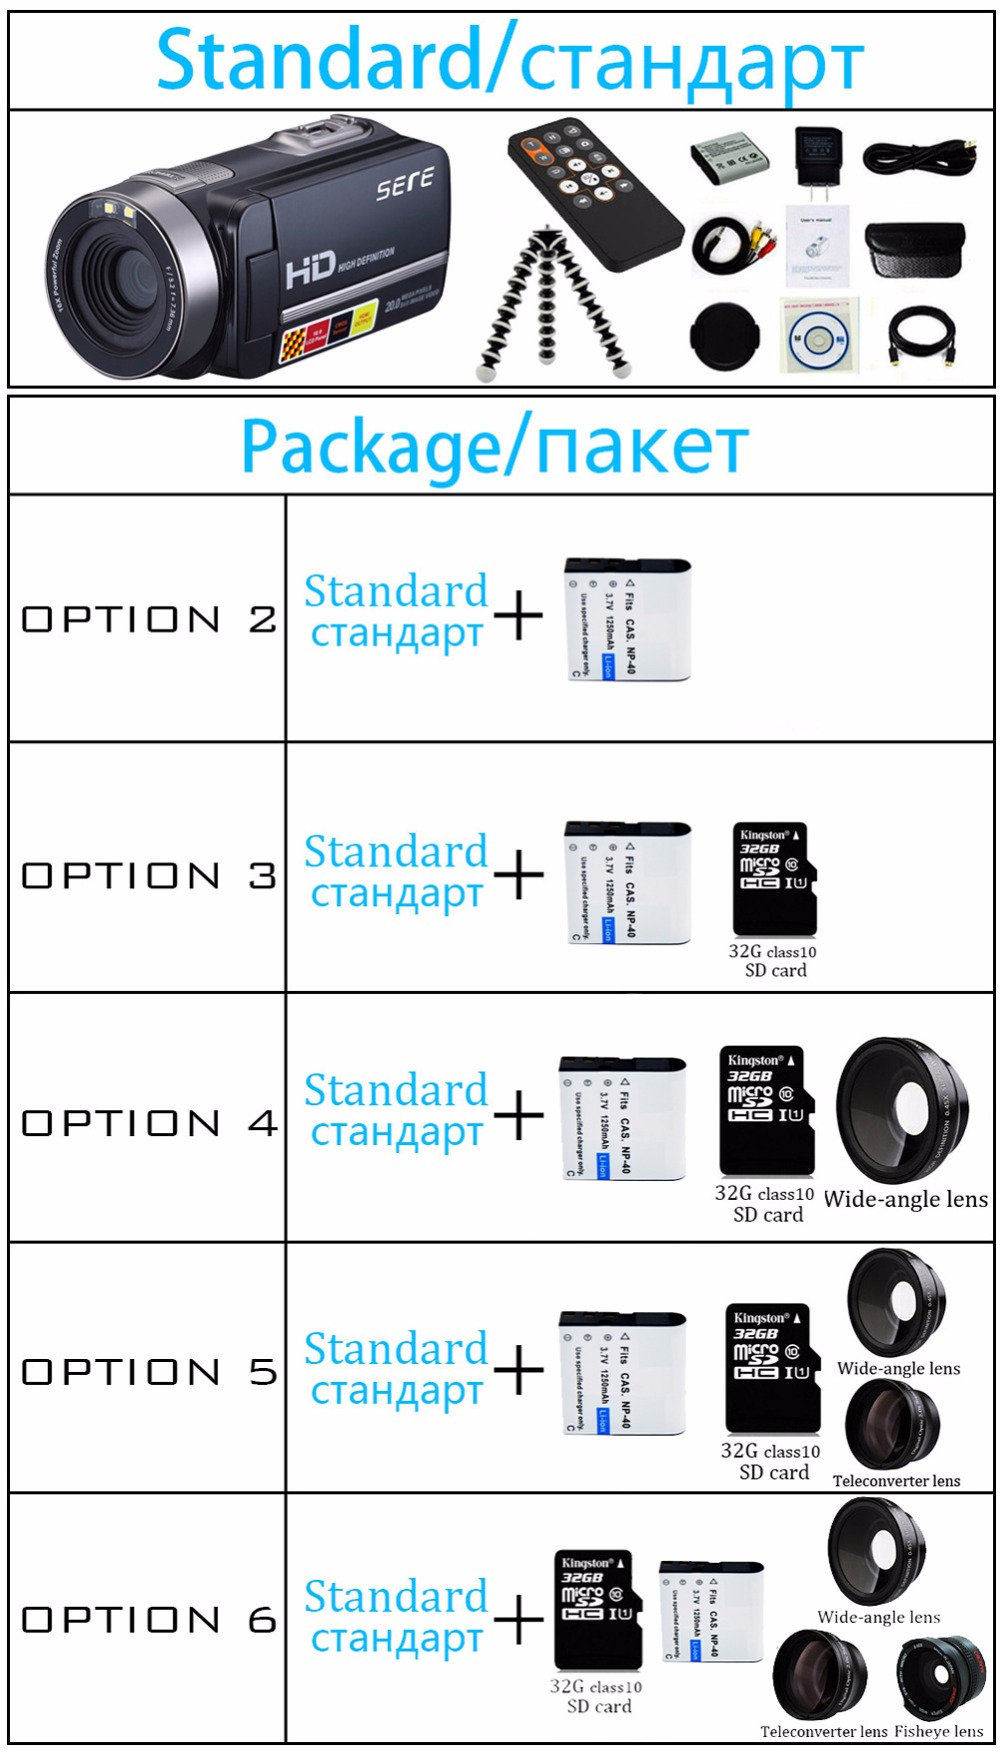 Seree 17 New Digital Camera Full HD 1080P 16x Zoom Recorder Camcorder Mini 3'' Touch DV DVR 24MP Video Camera 2